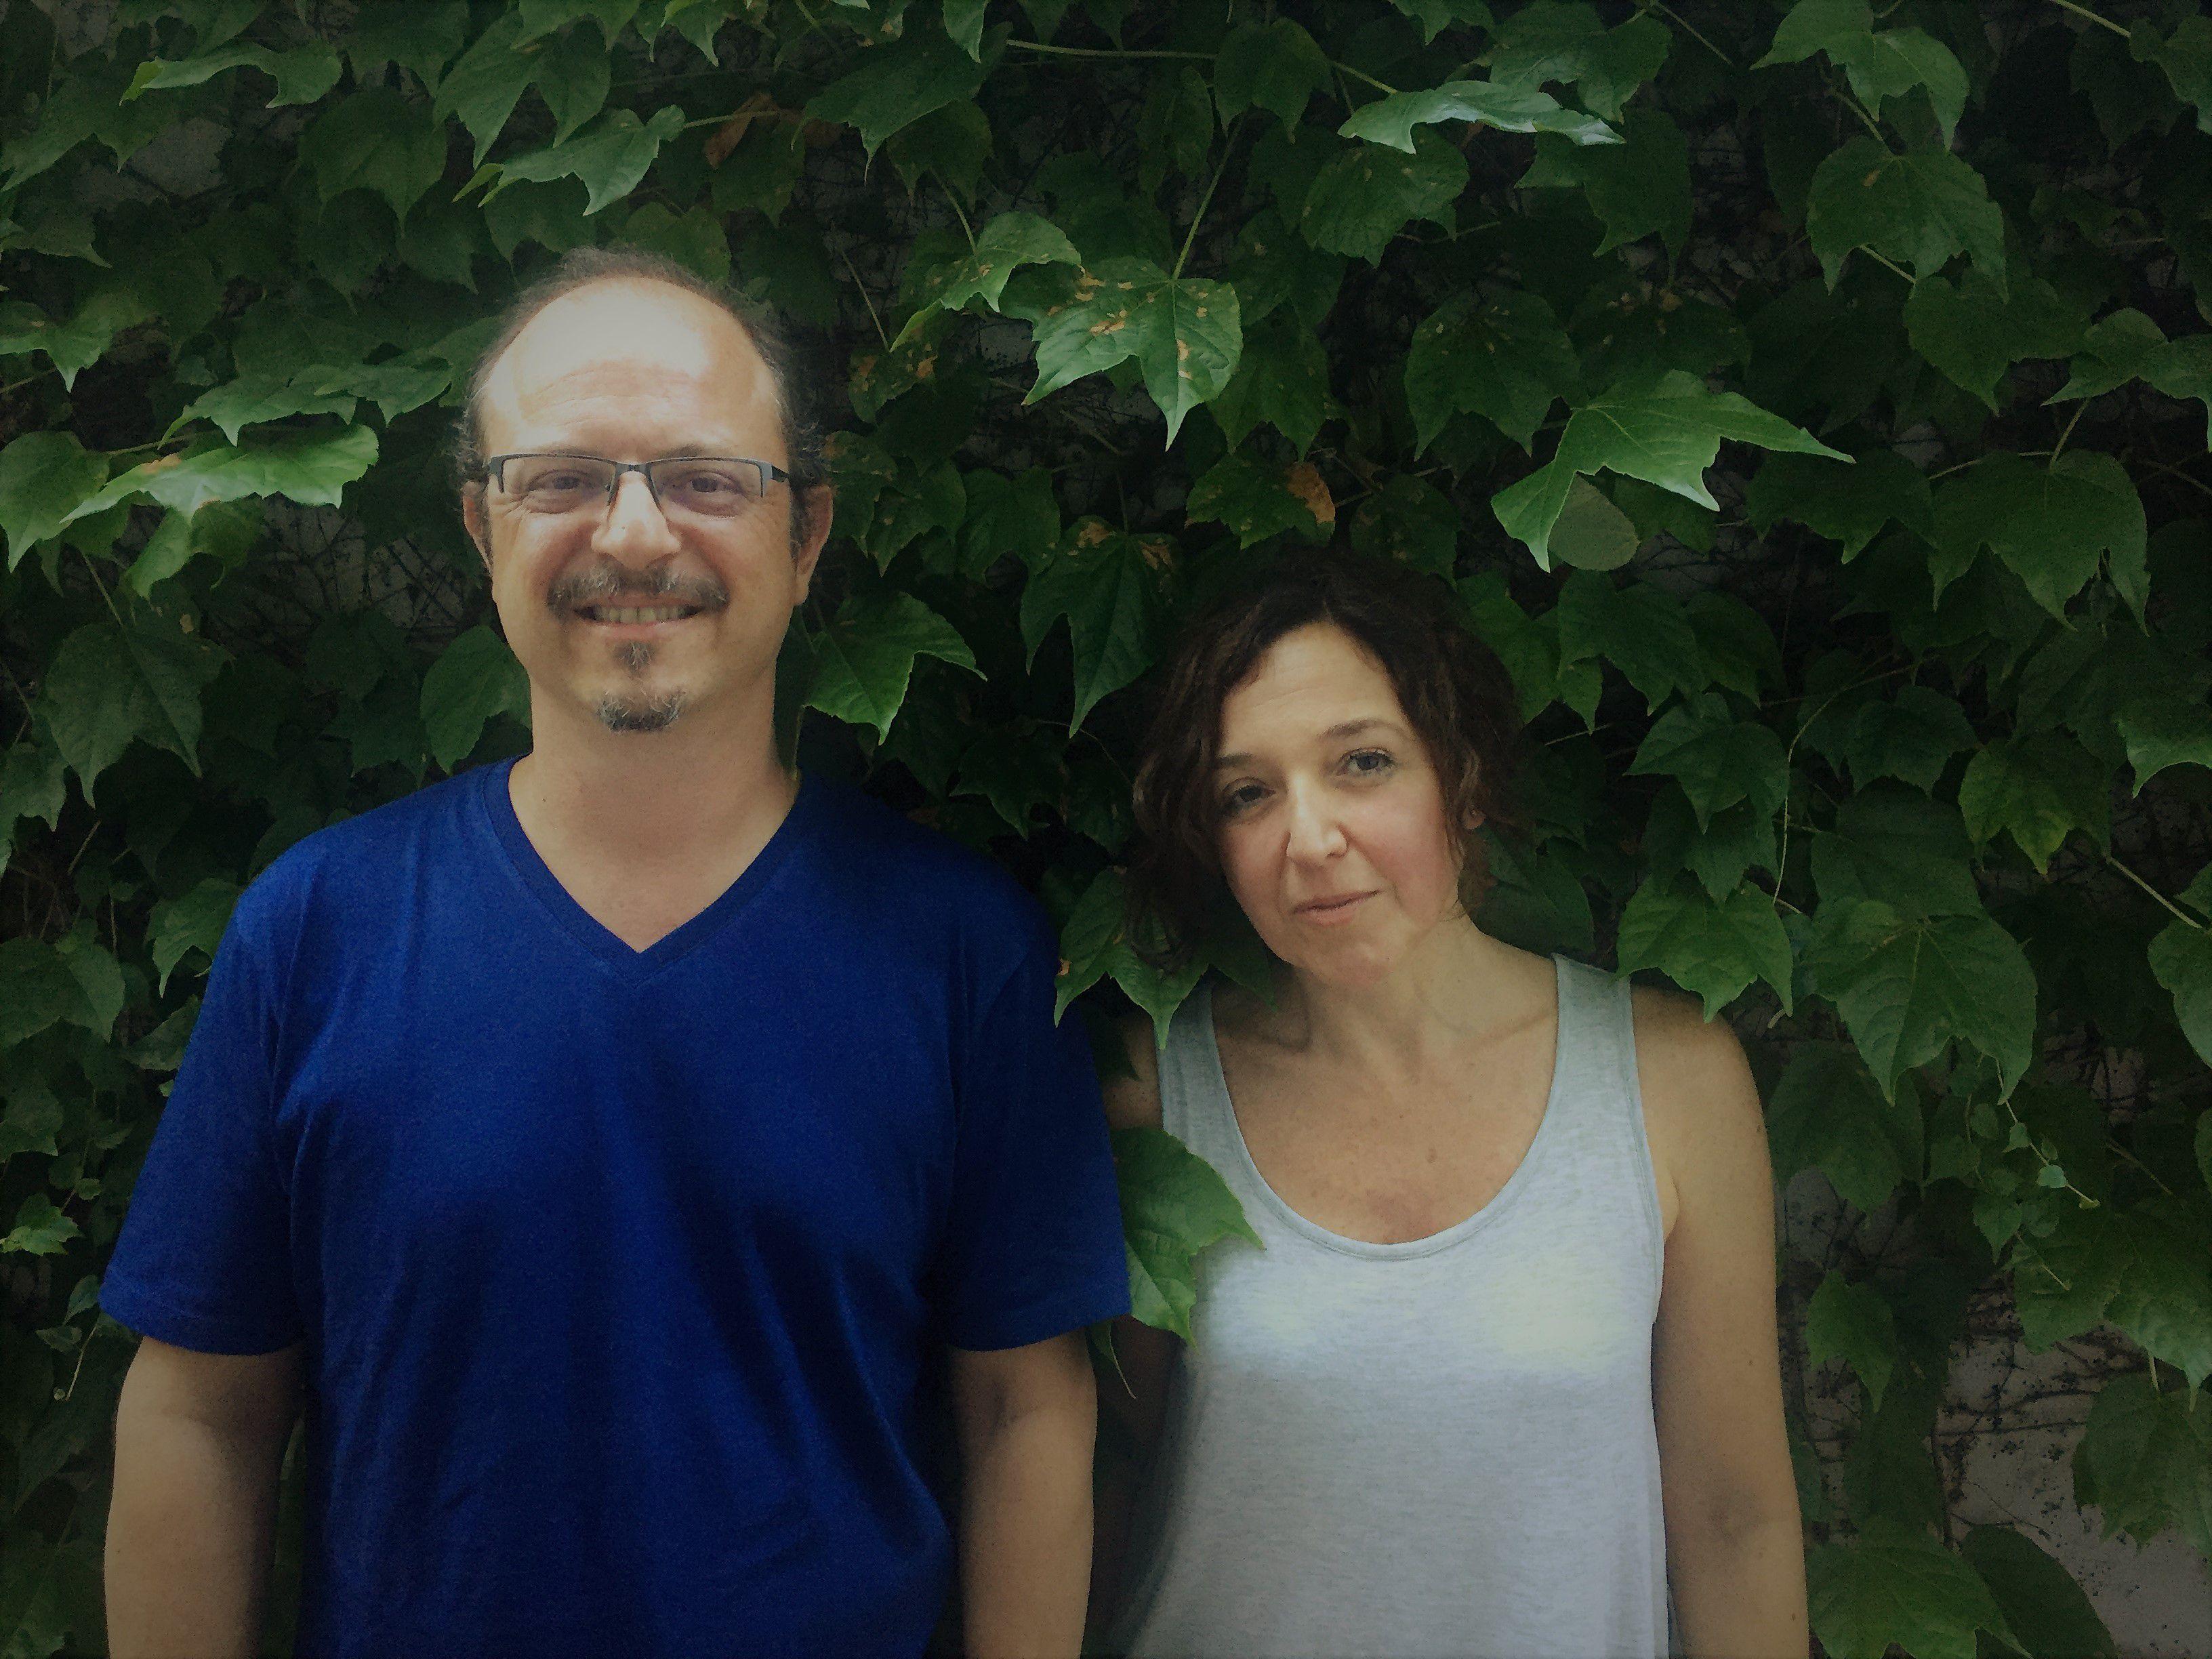 Alejandro Grimson es antrolpólogo. Eleonor Faur es socióloga.